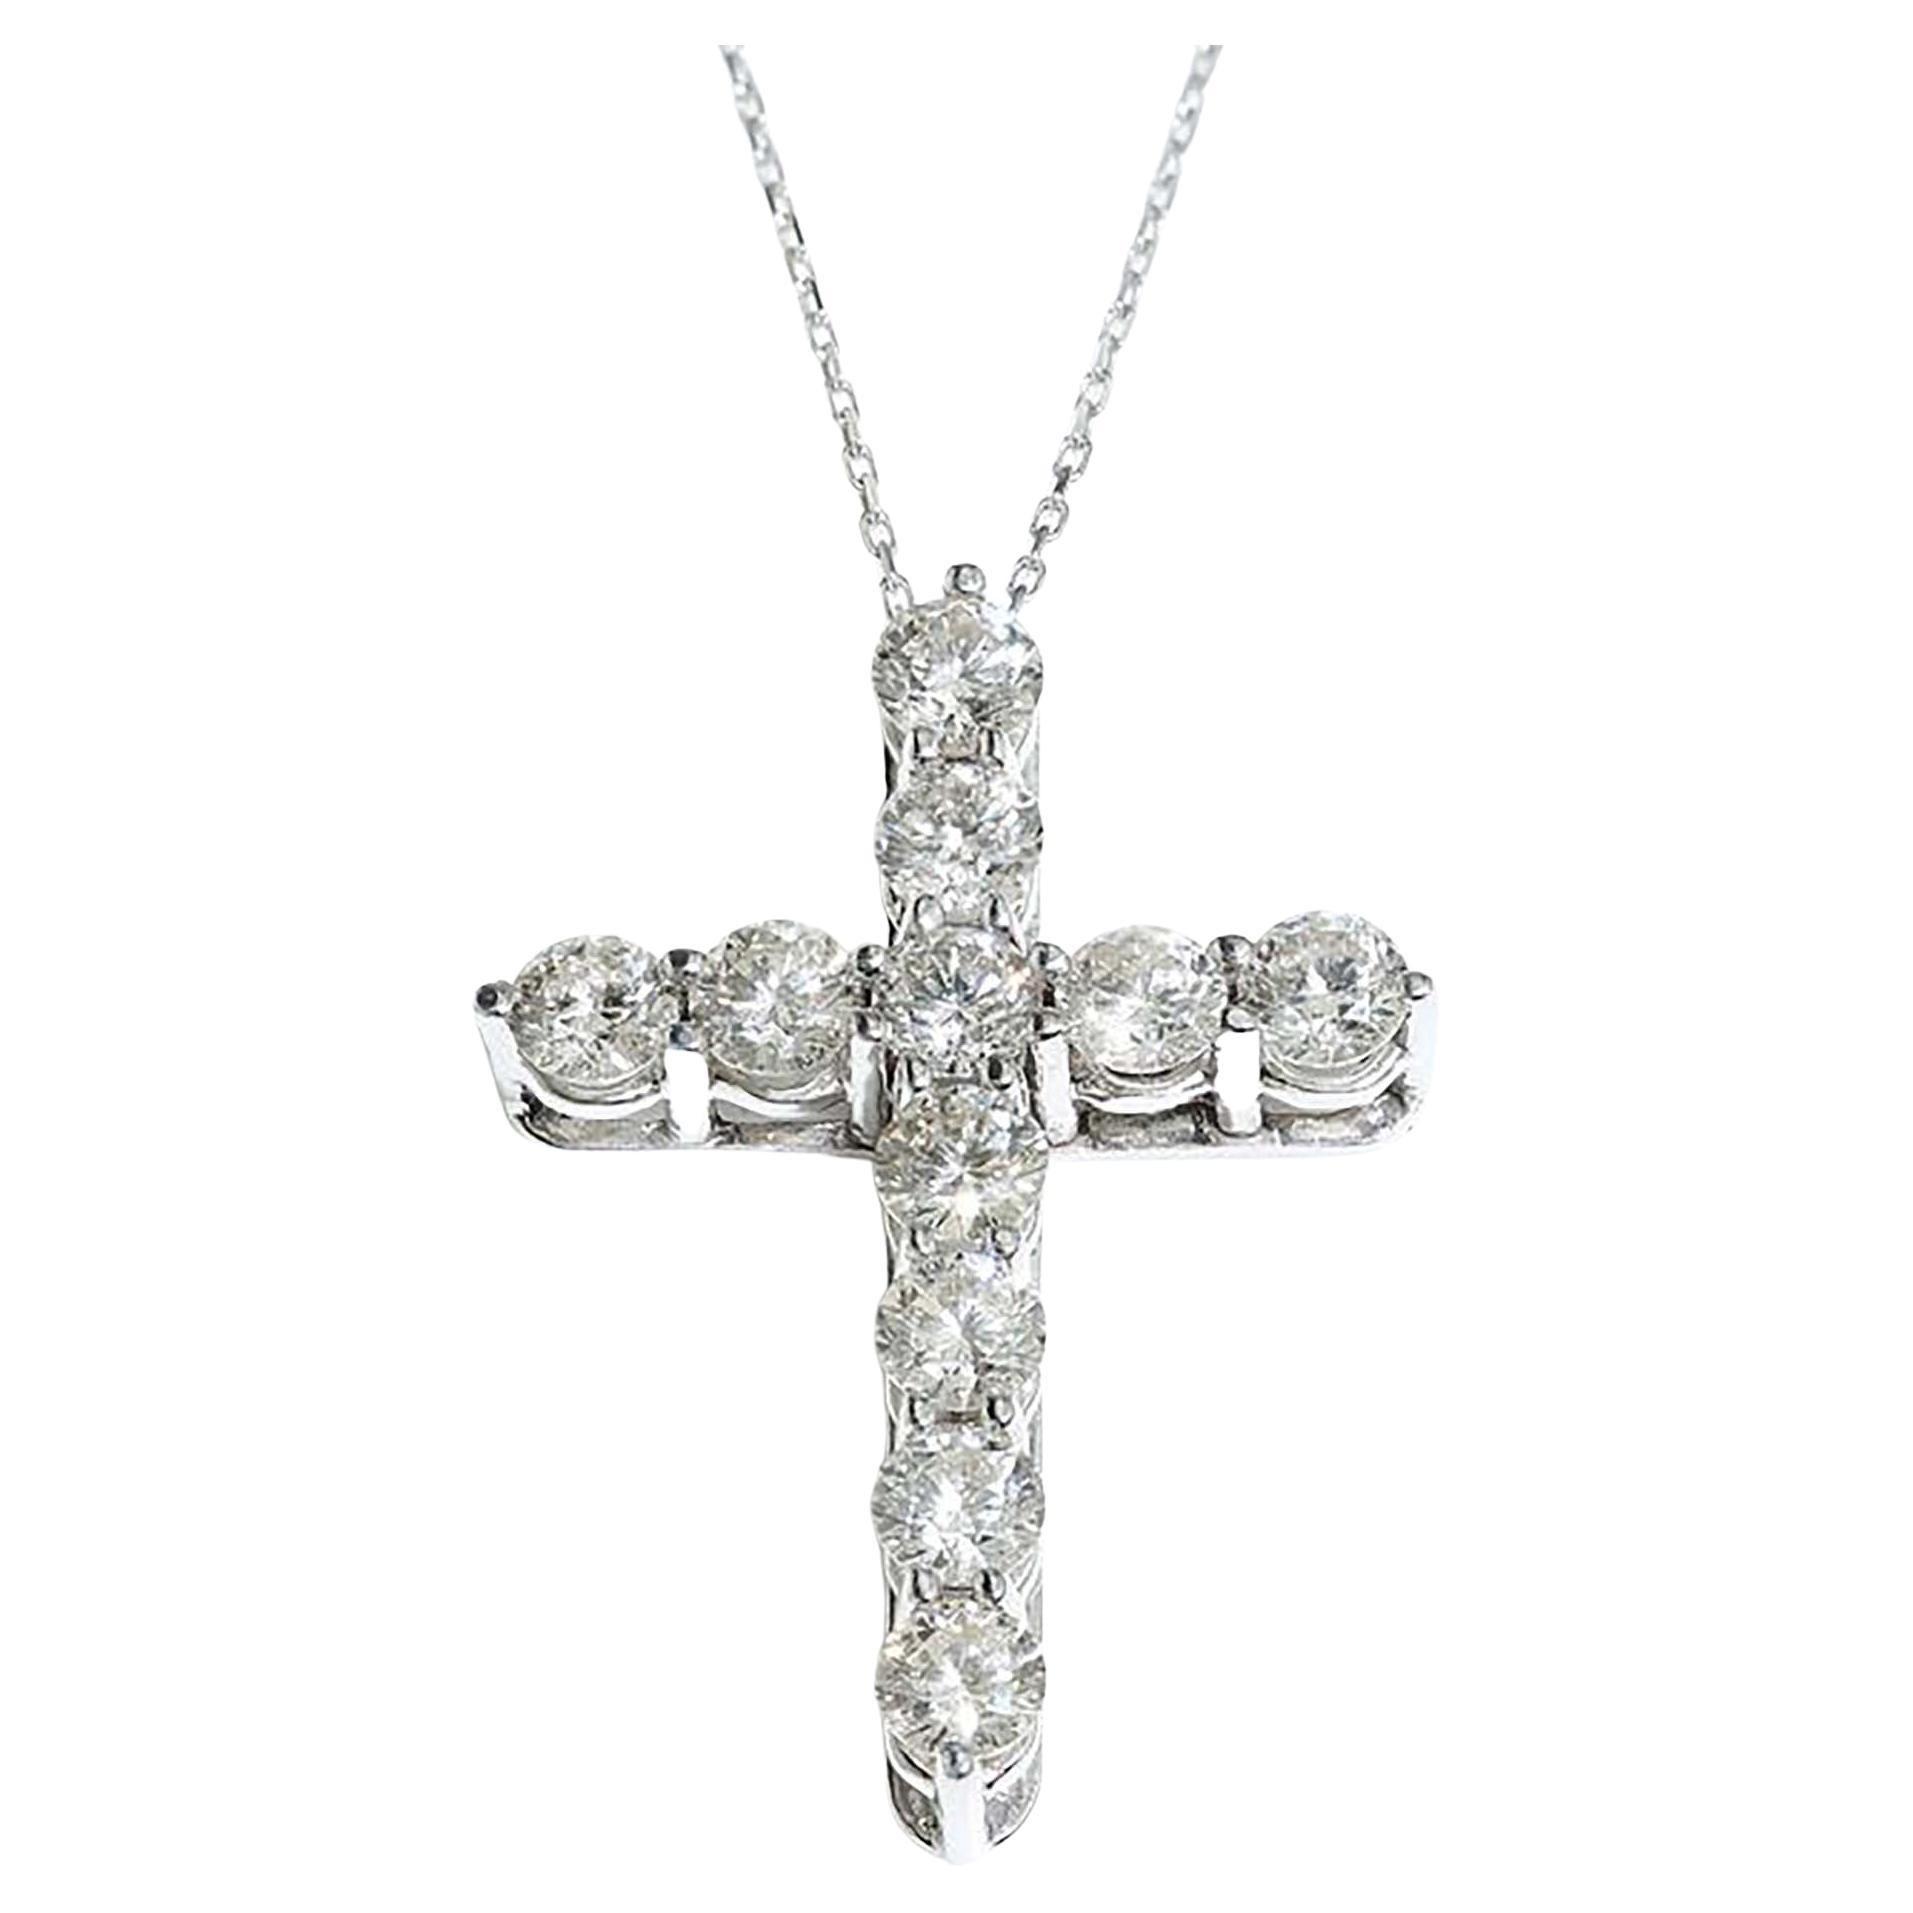 Tiffany & Co 18kt White Gold Cross Pendant with Diamonds